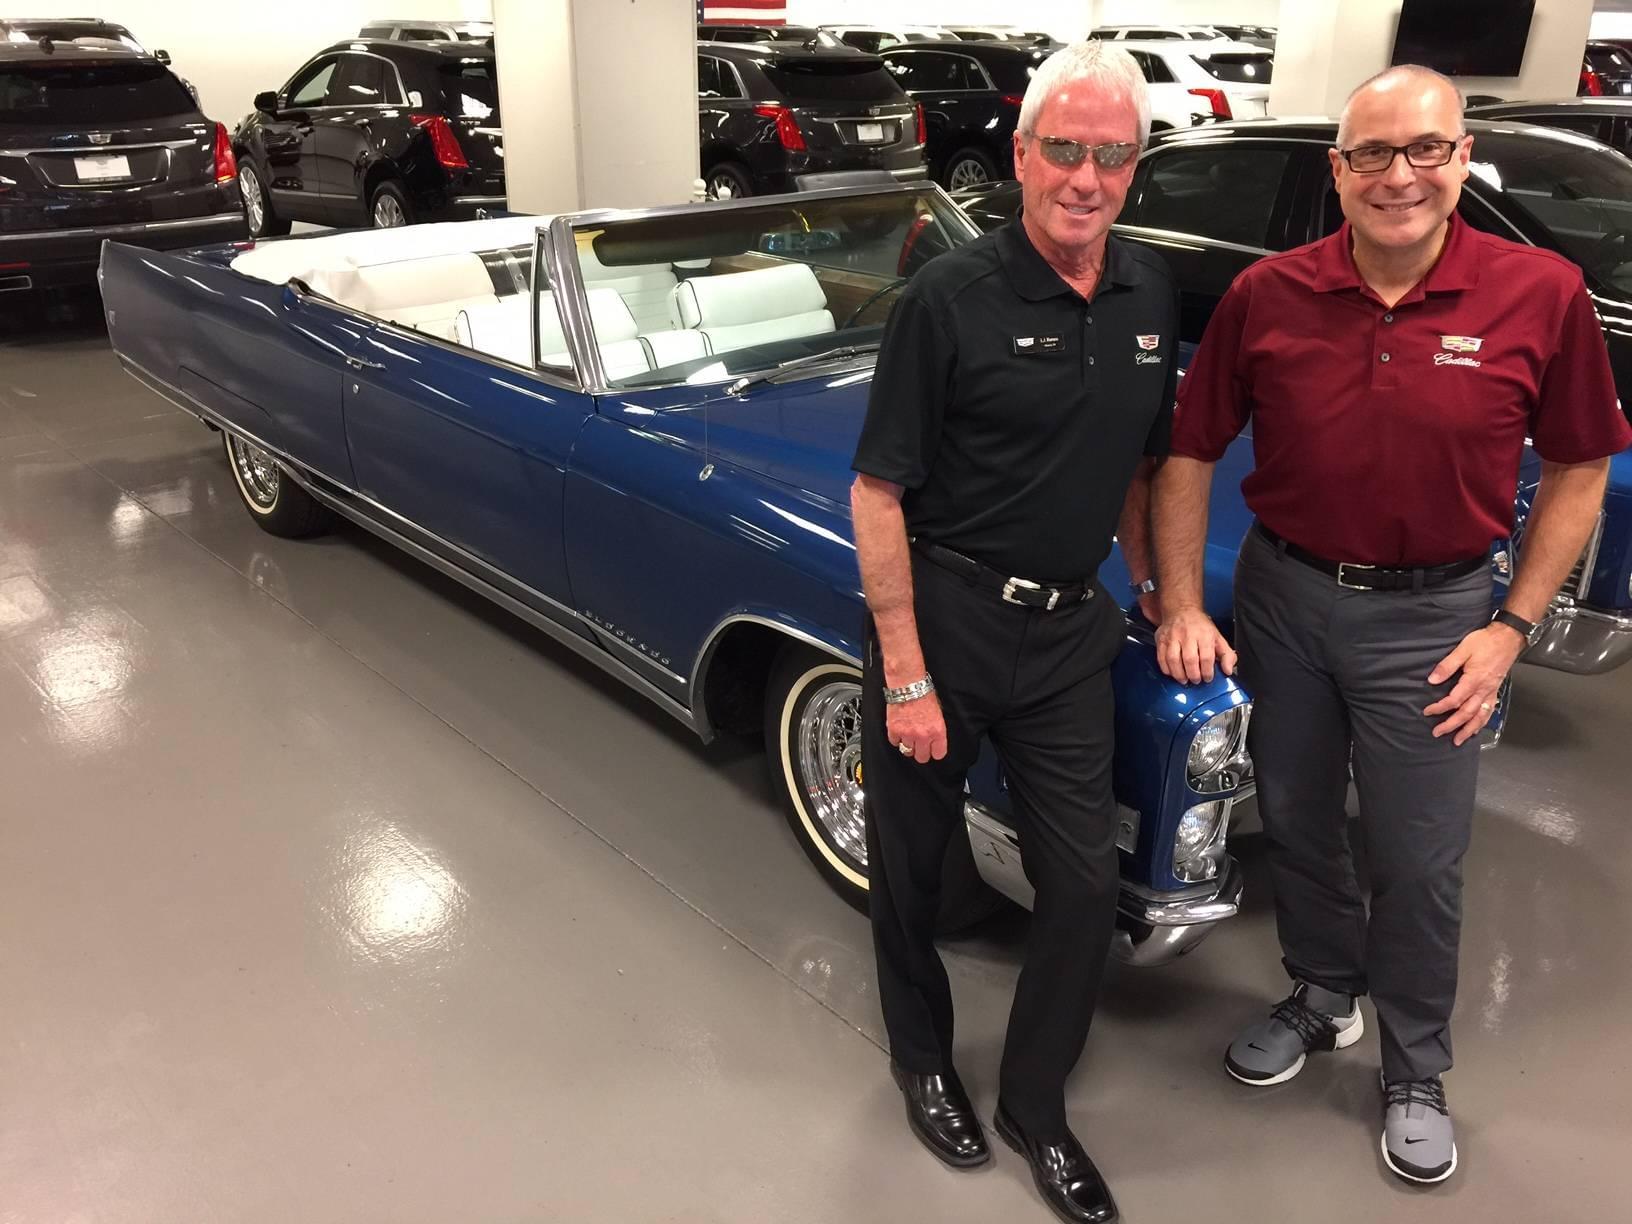 Findlay Cadillac executive L J Harness brings experience munity